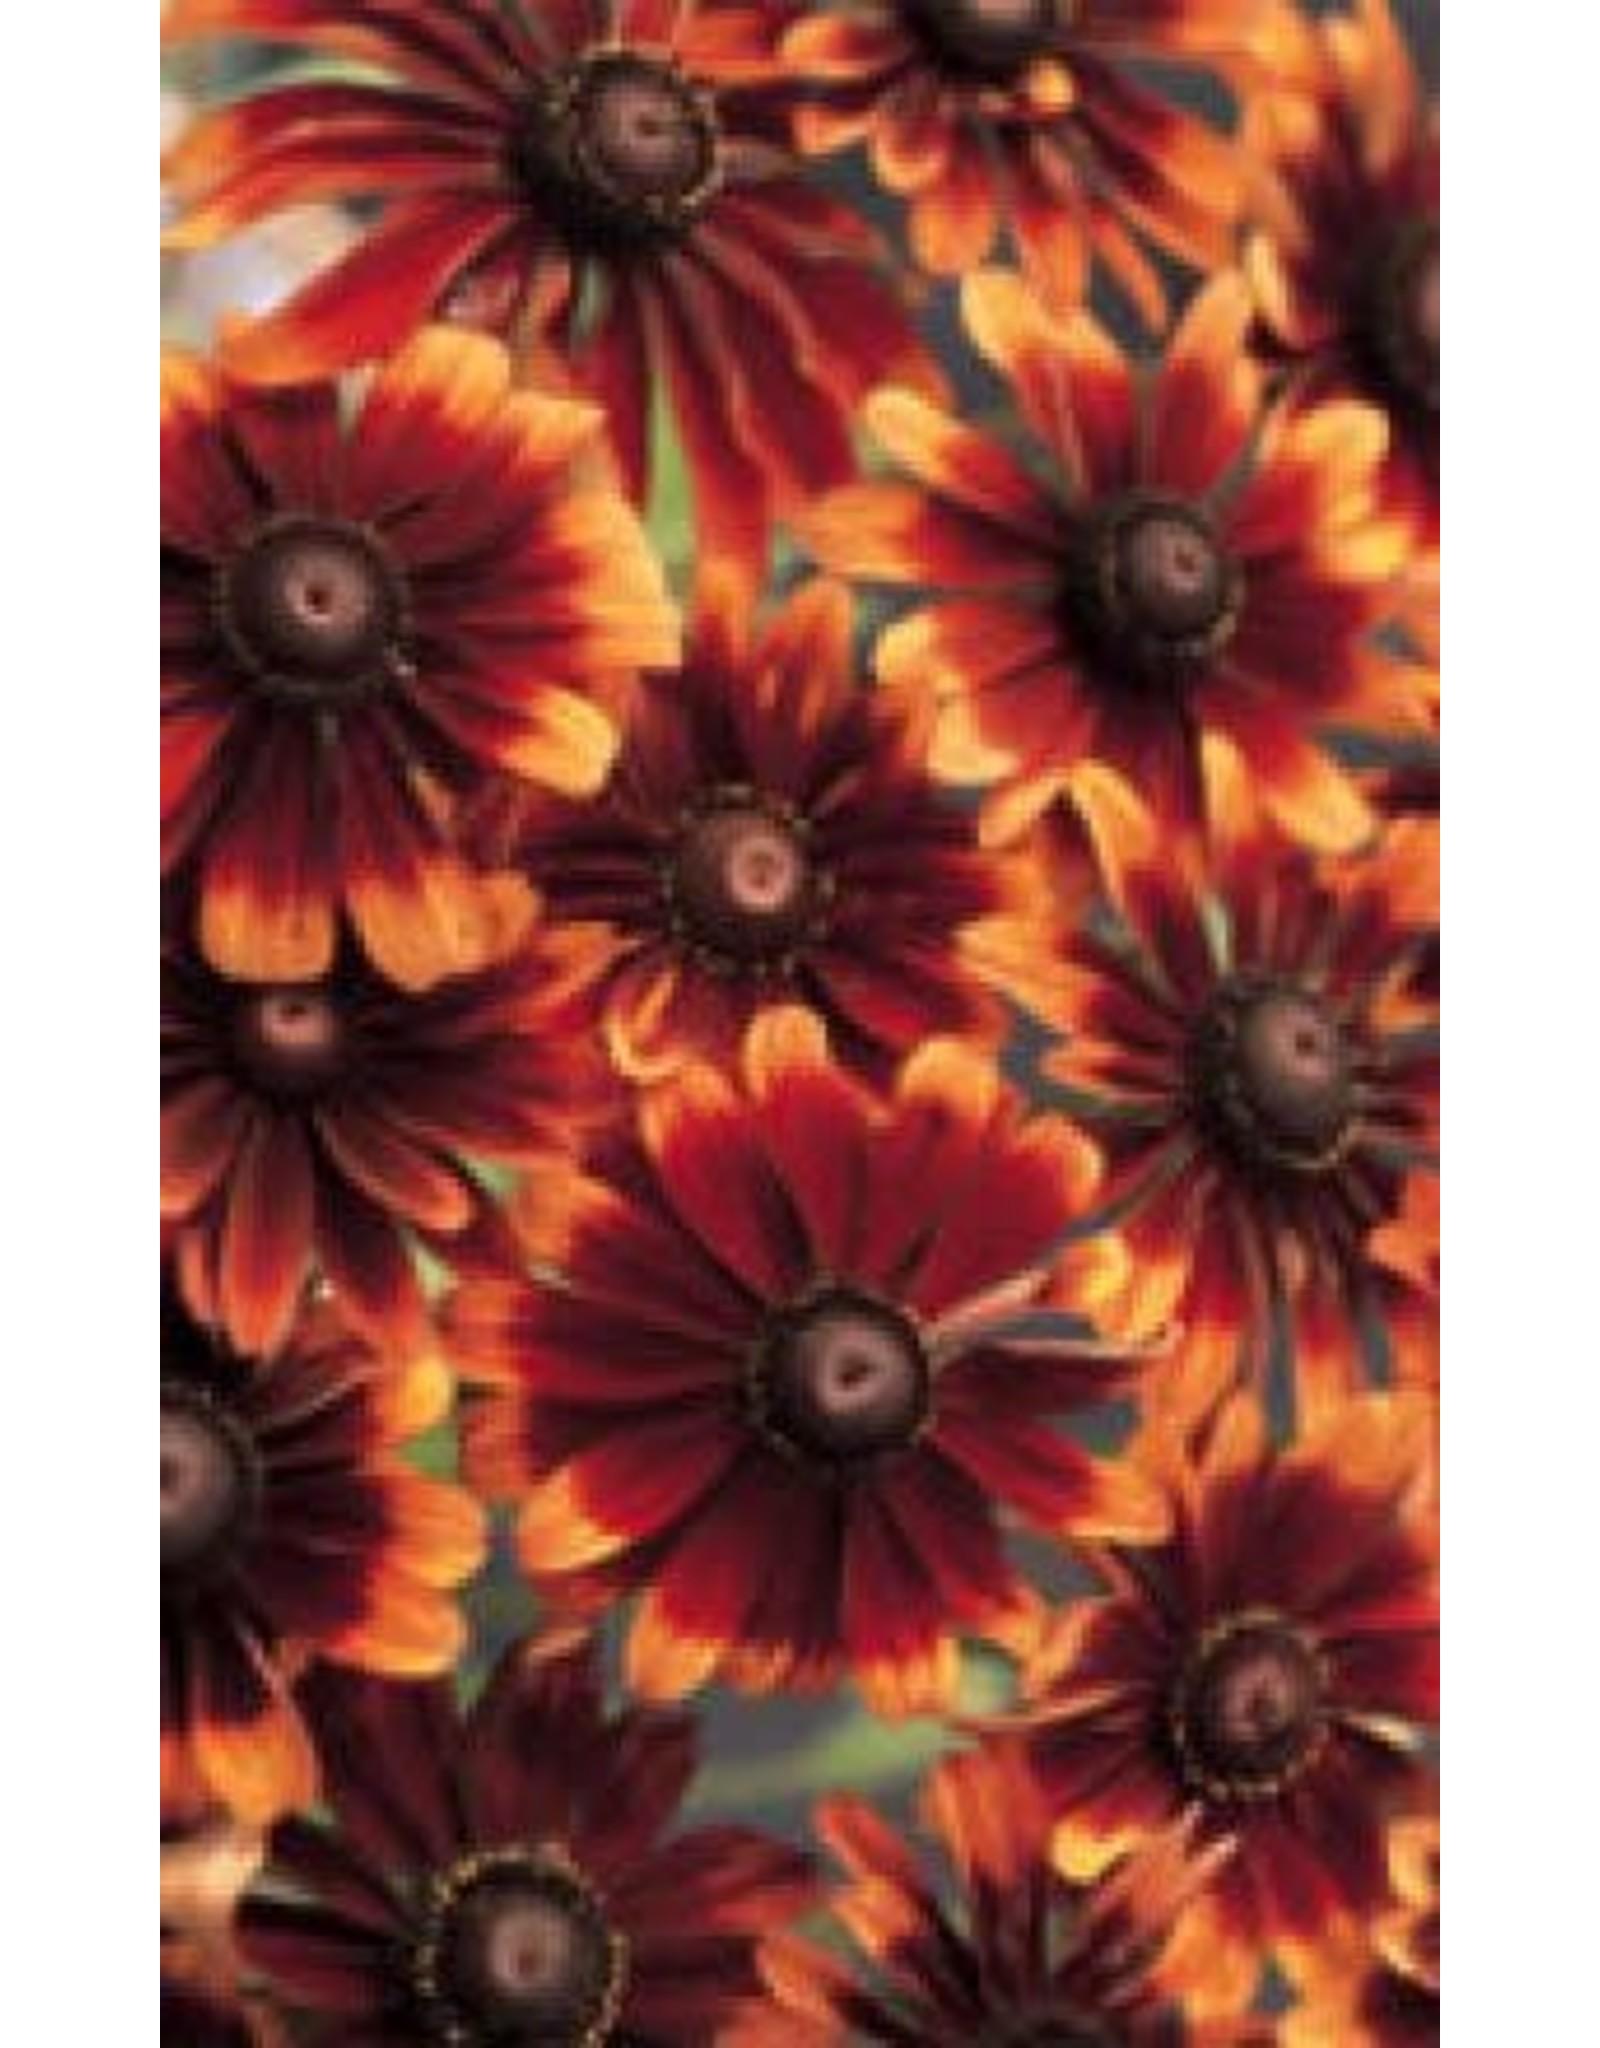 Chocolate/Orange Rudbeckia Seeds (Annual Type) 6610